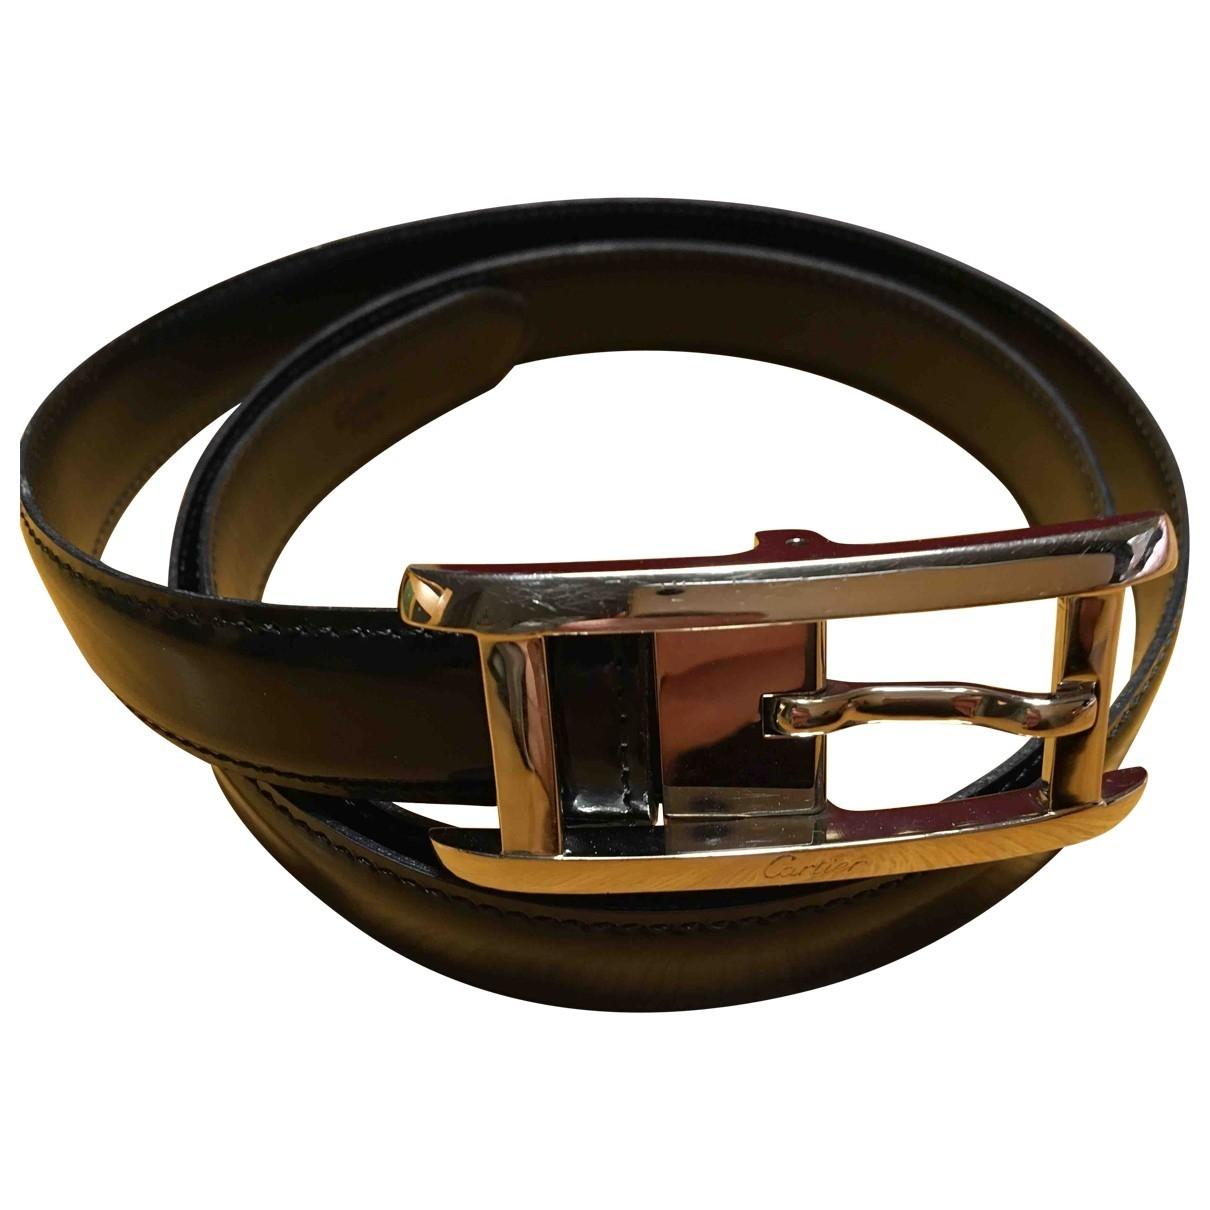 Cartier \N Black Patent leather belt for Women 85 cm